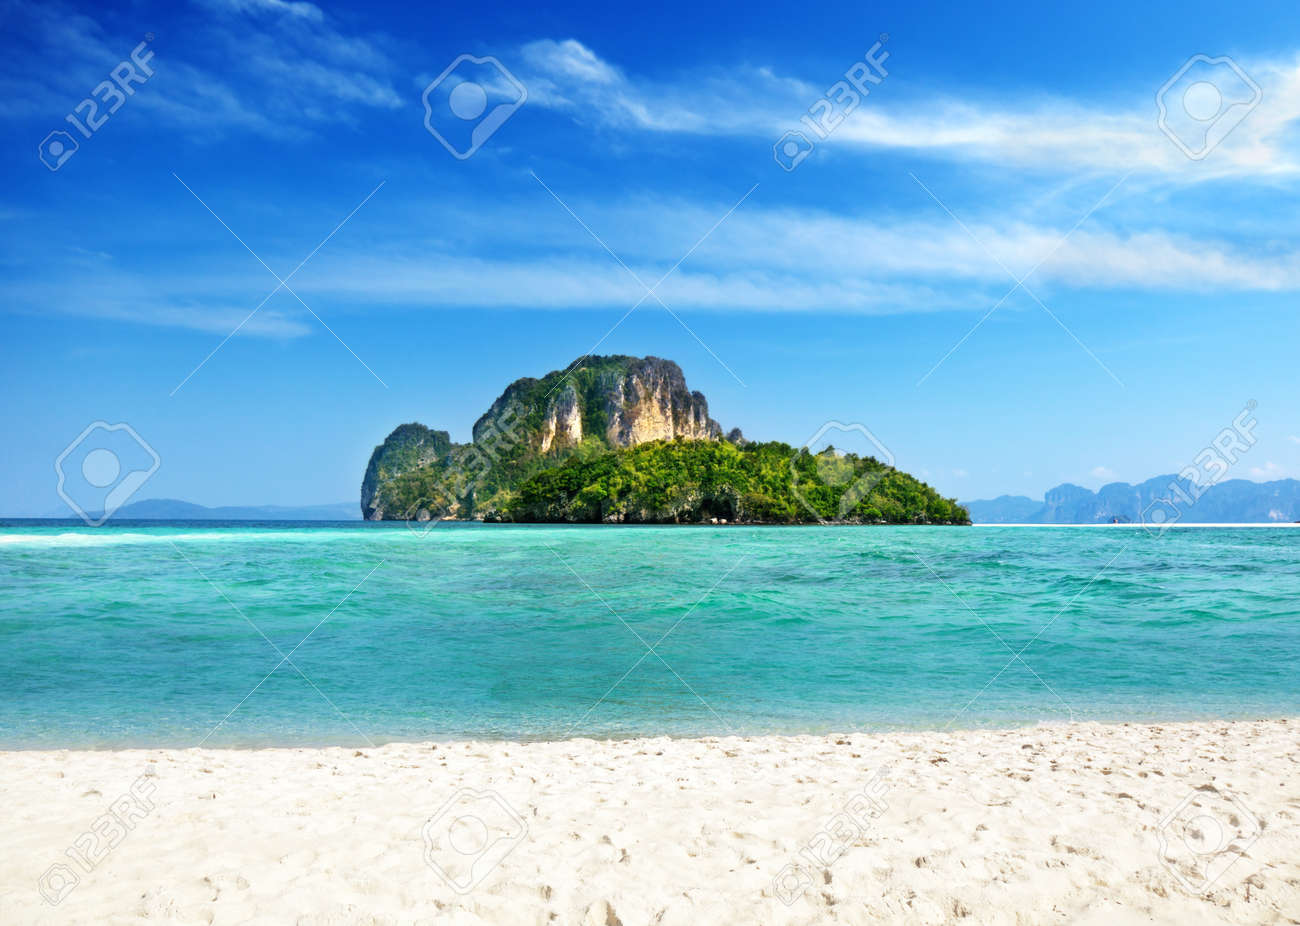 Poda island in Thailand Stock Photo - 9641789